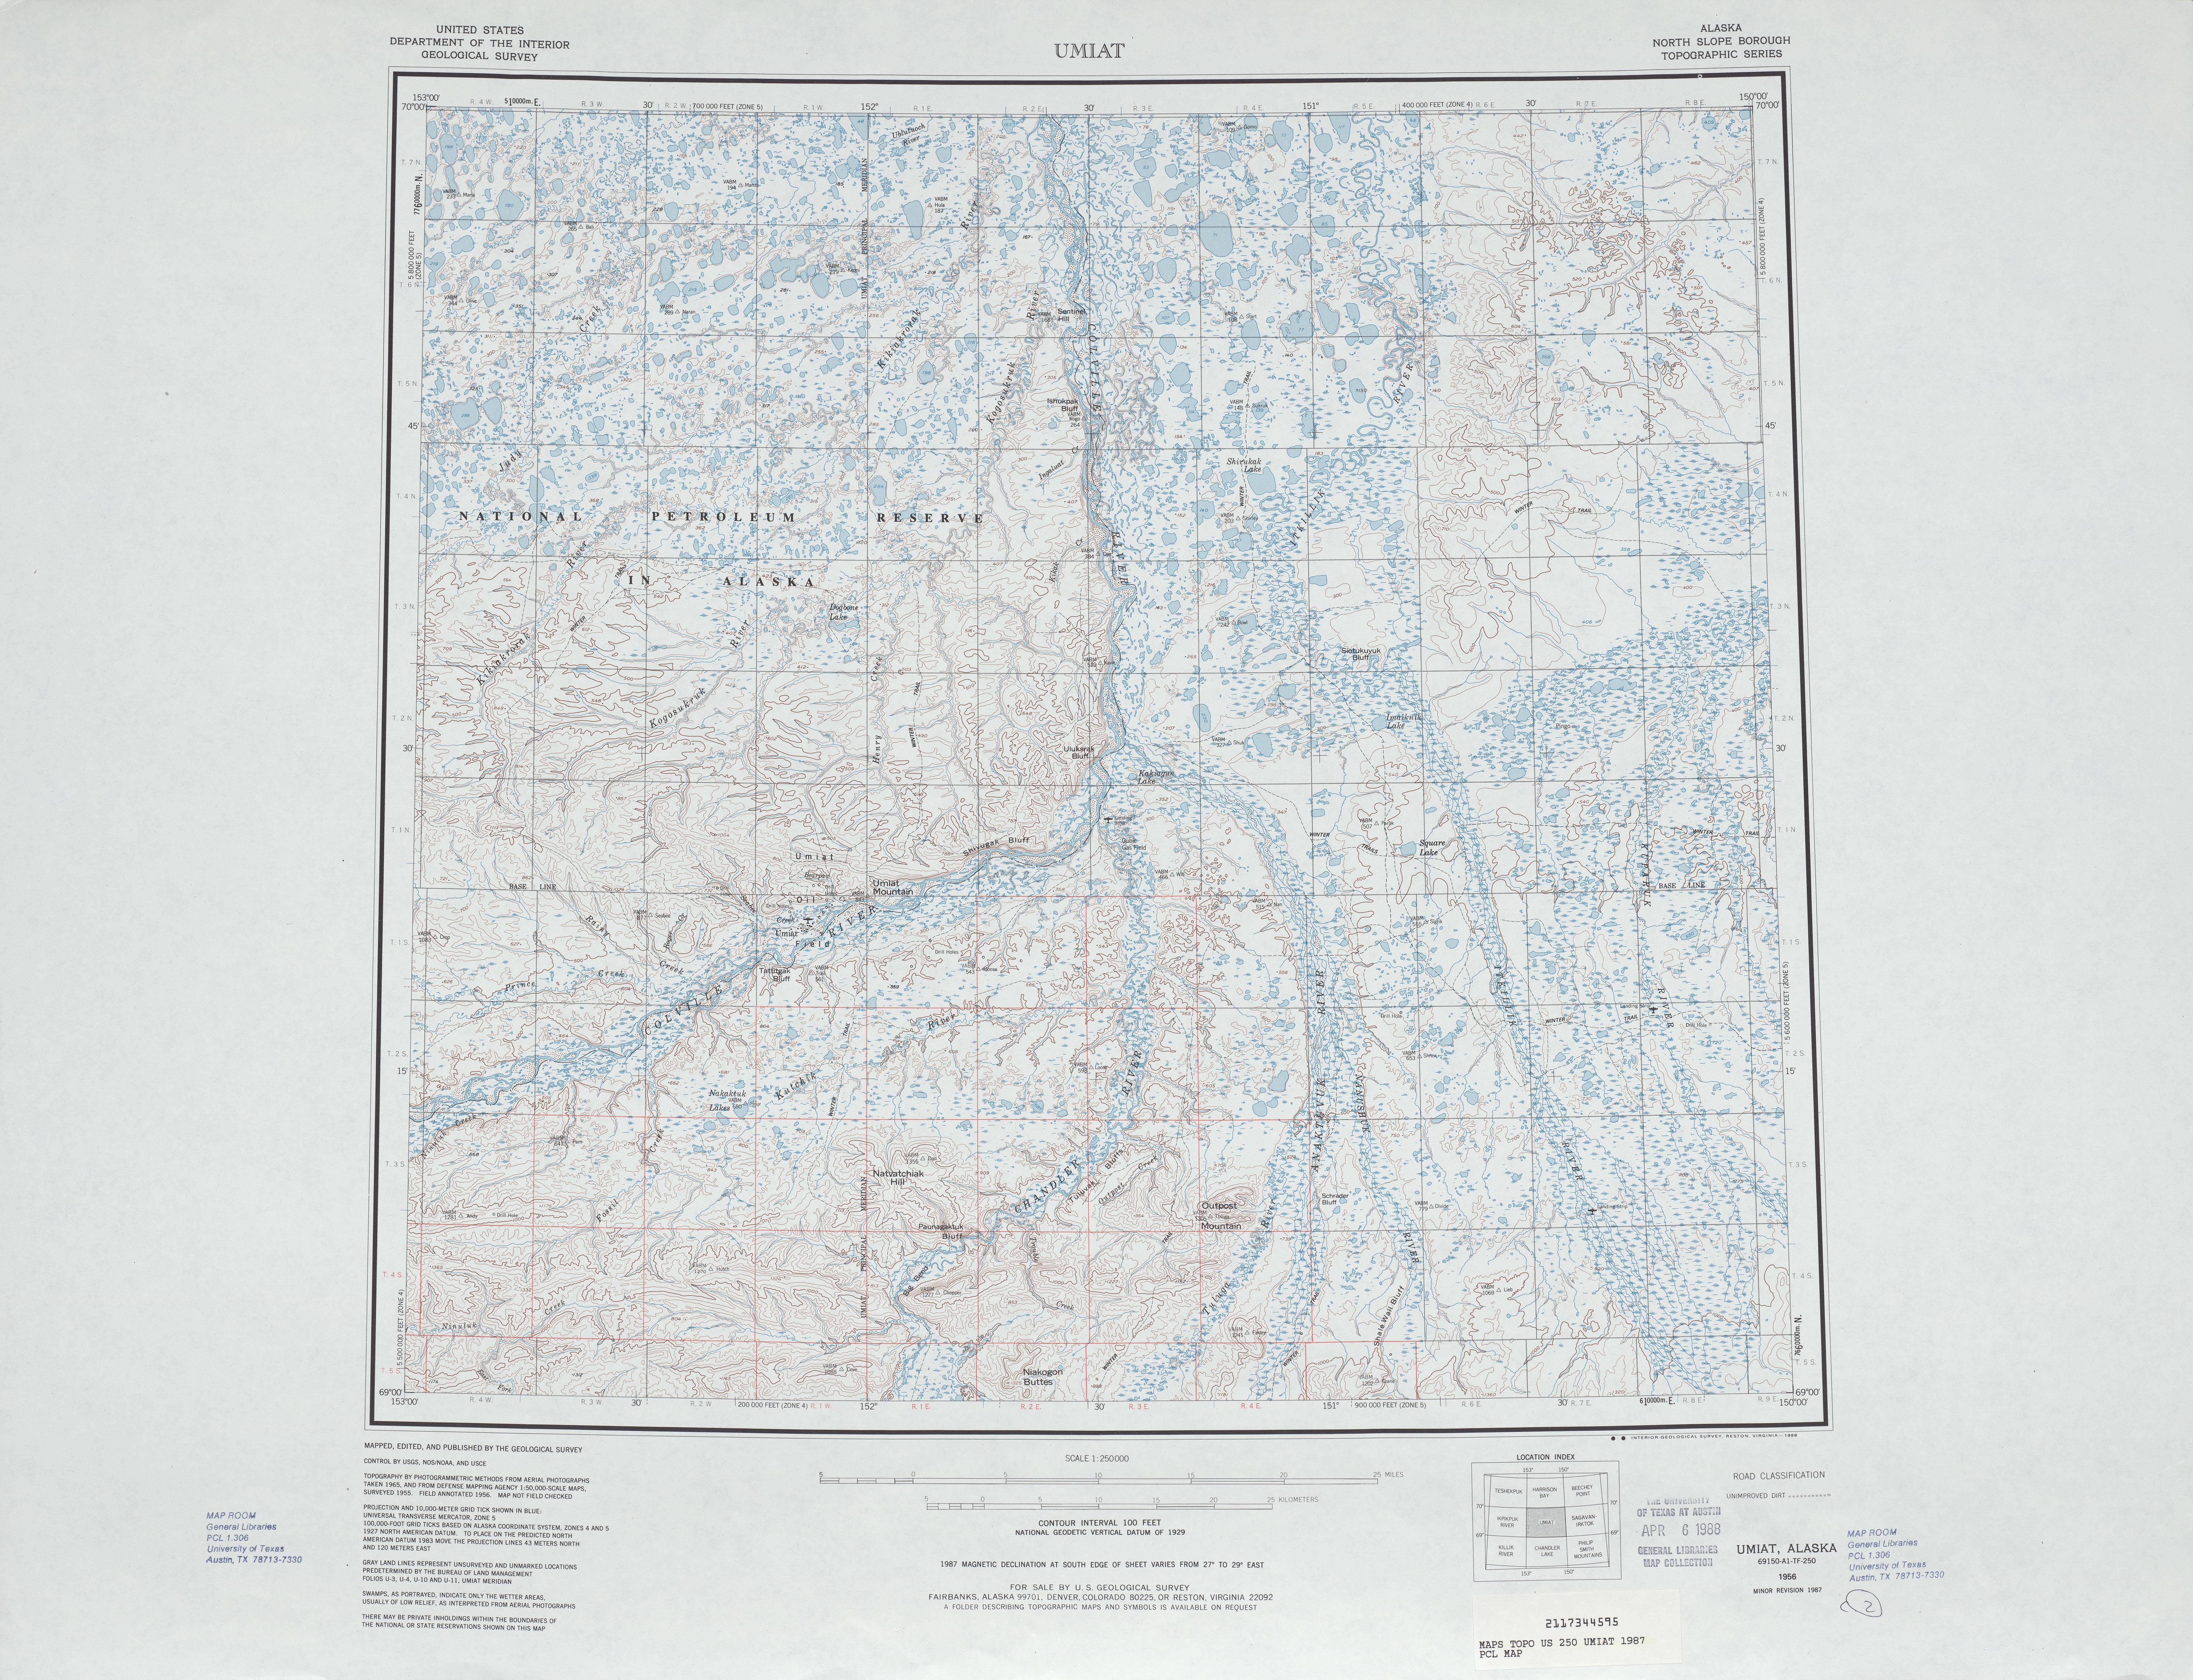 Umiat Topographic Map Sheet, United States 1987